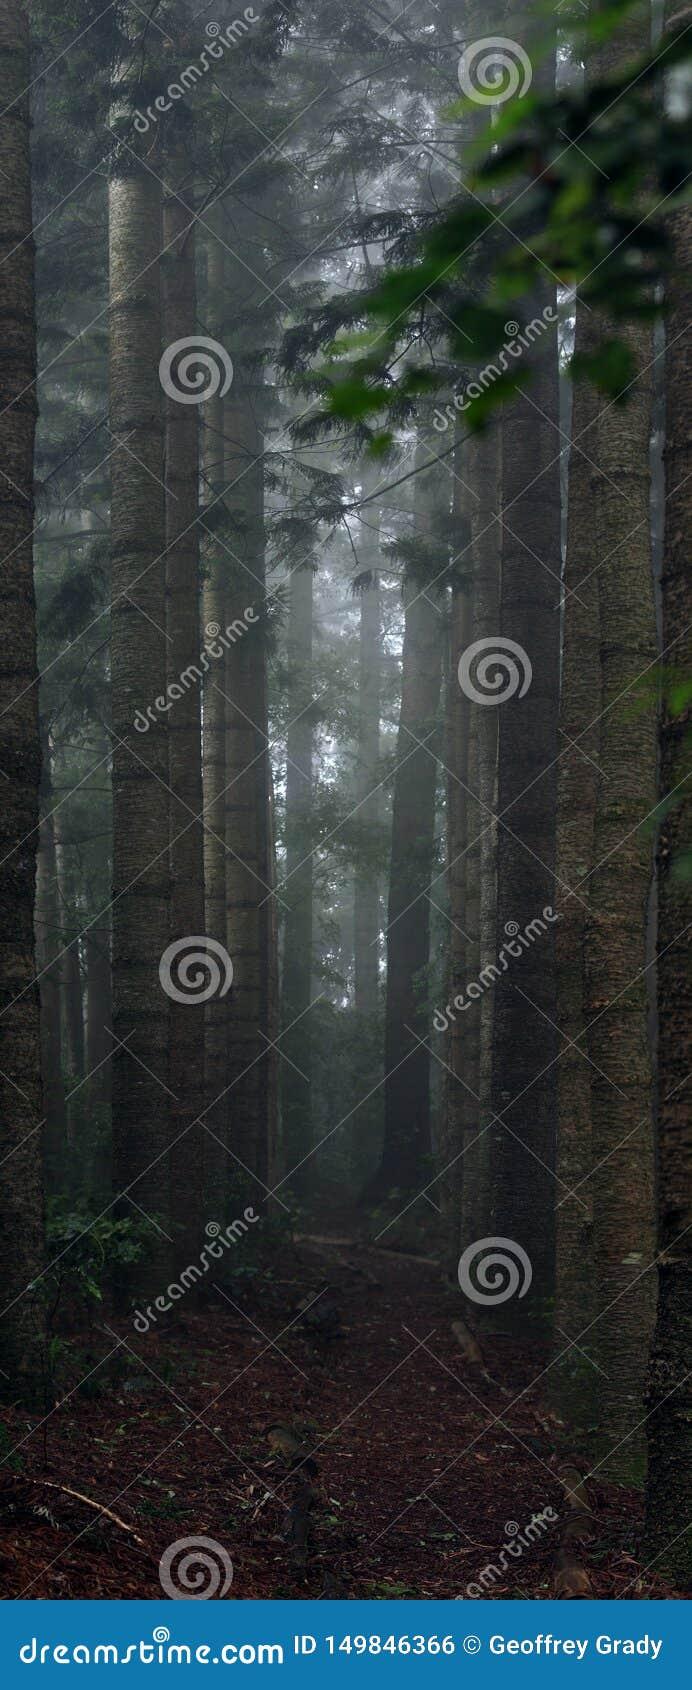 Trayectoria sola entre árboles altos